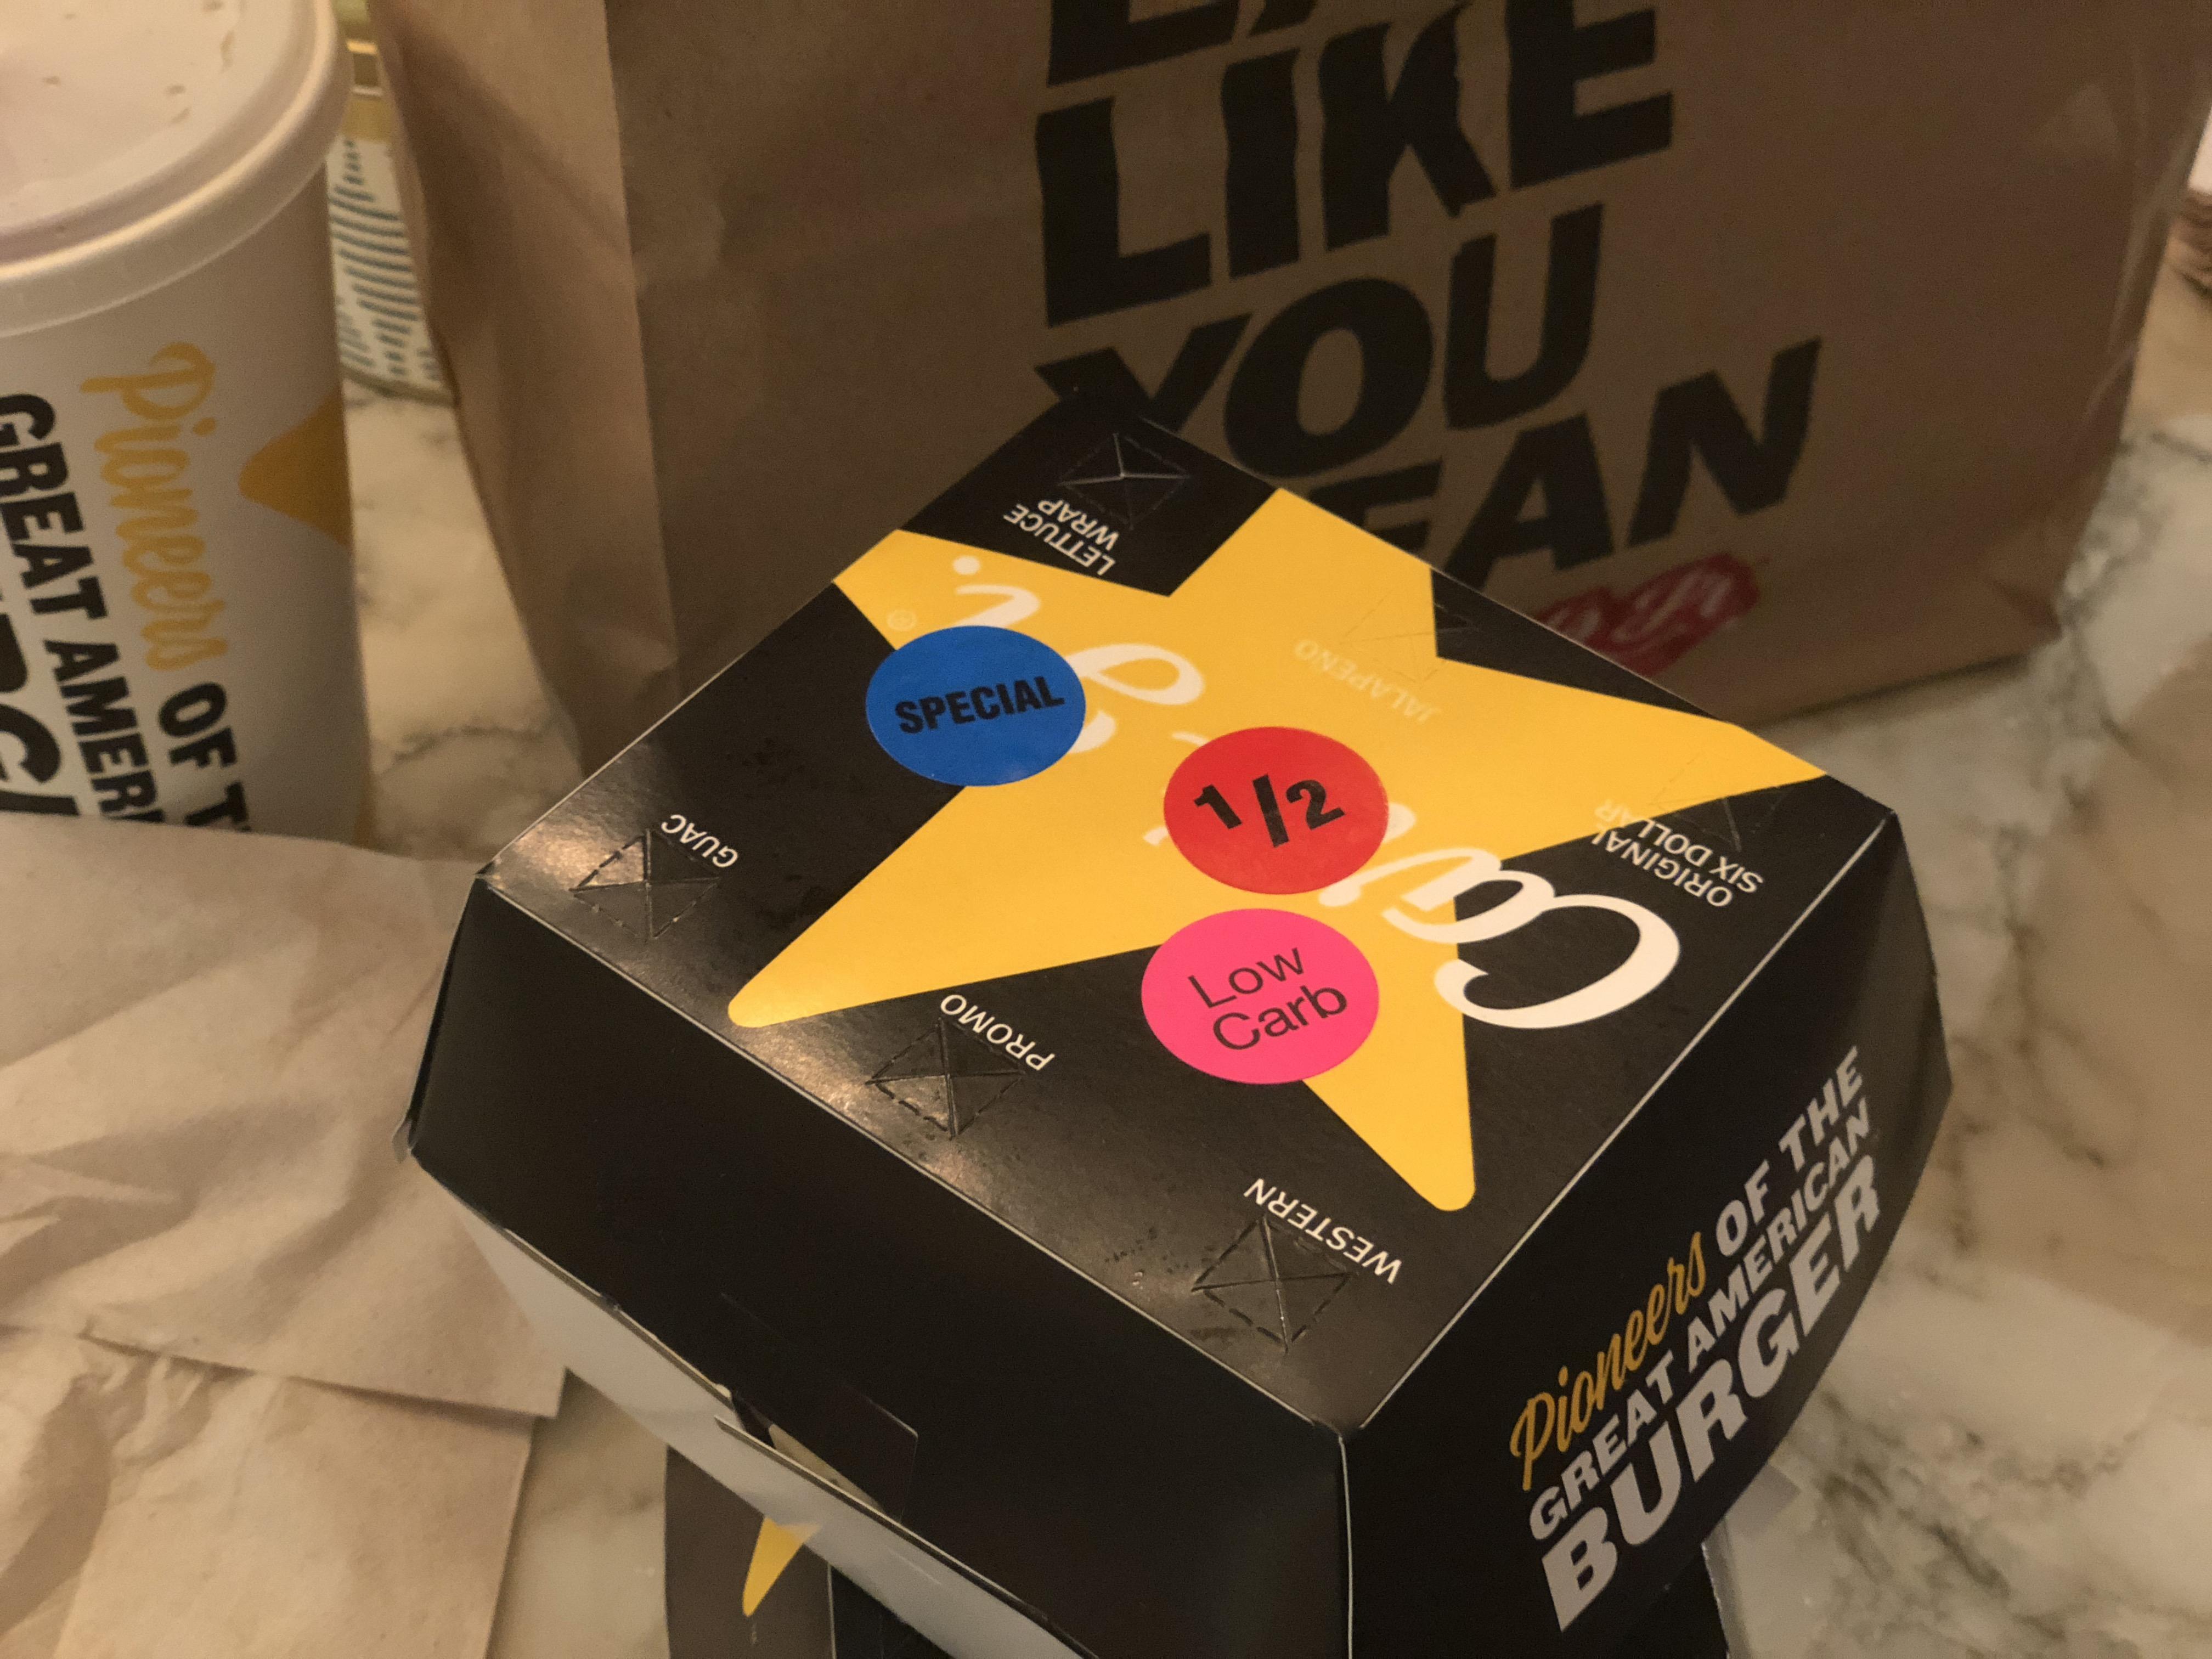 free carls jr hardees thickburger deal – thickburger box